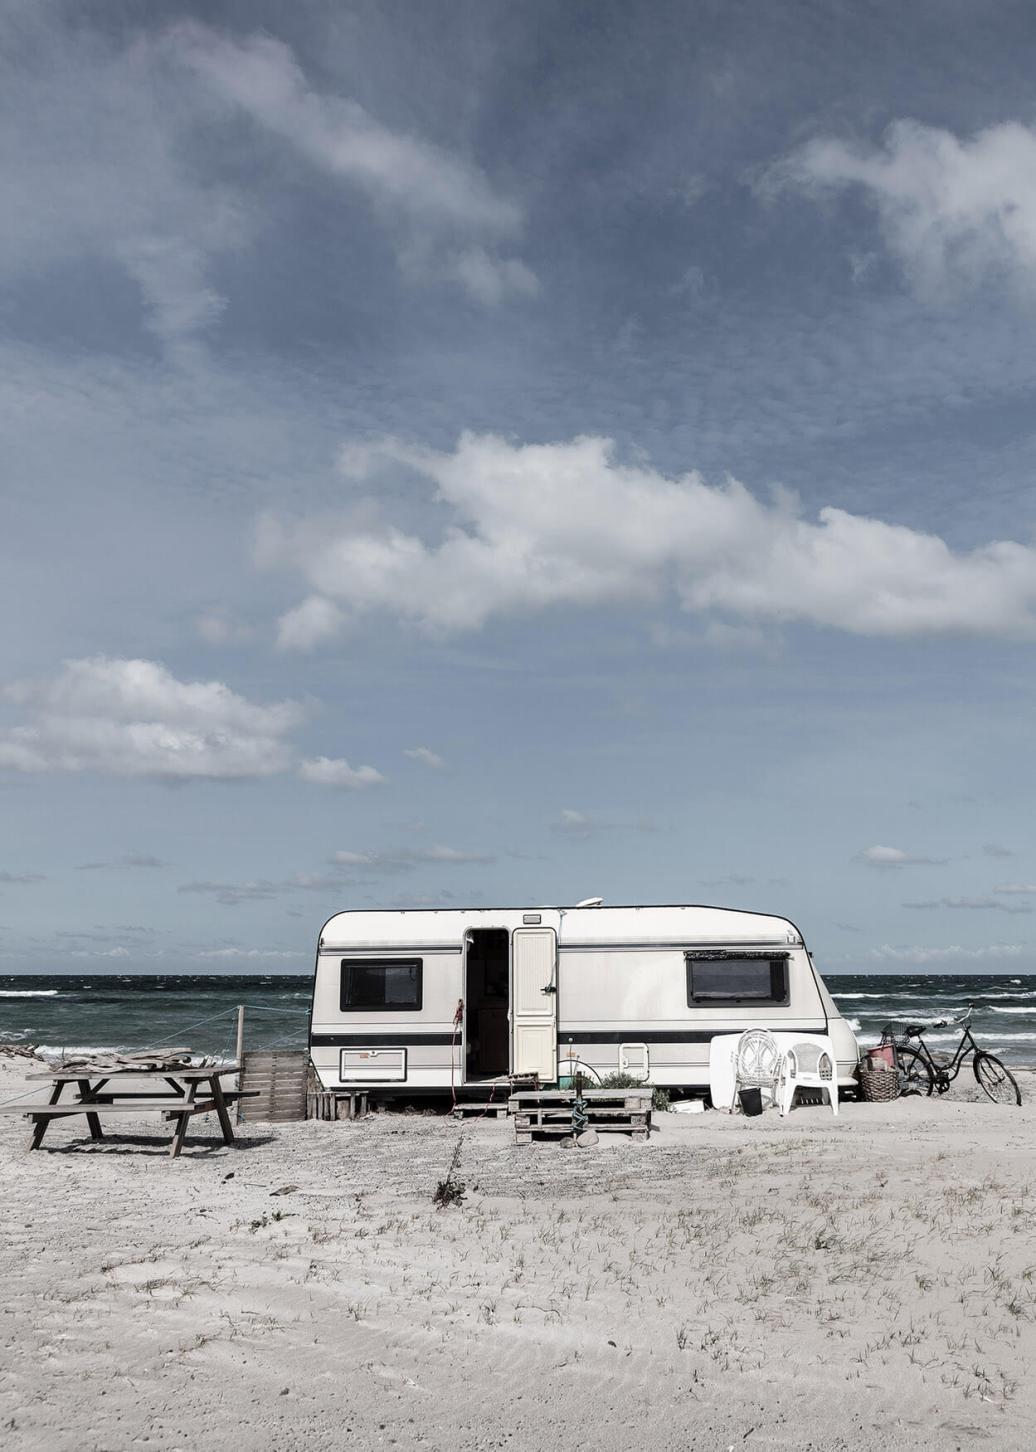 Camping plakat